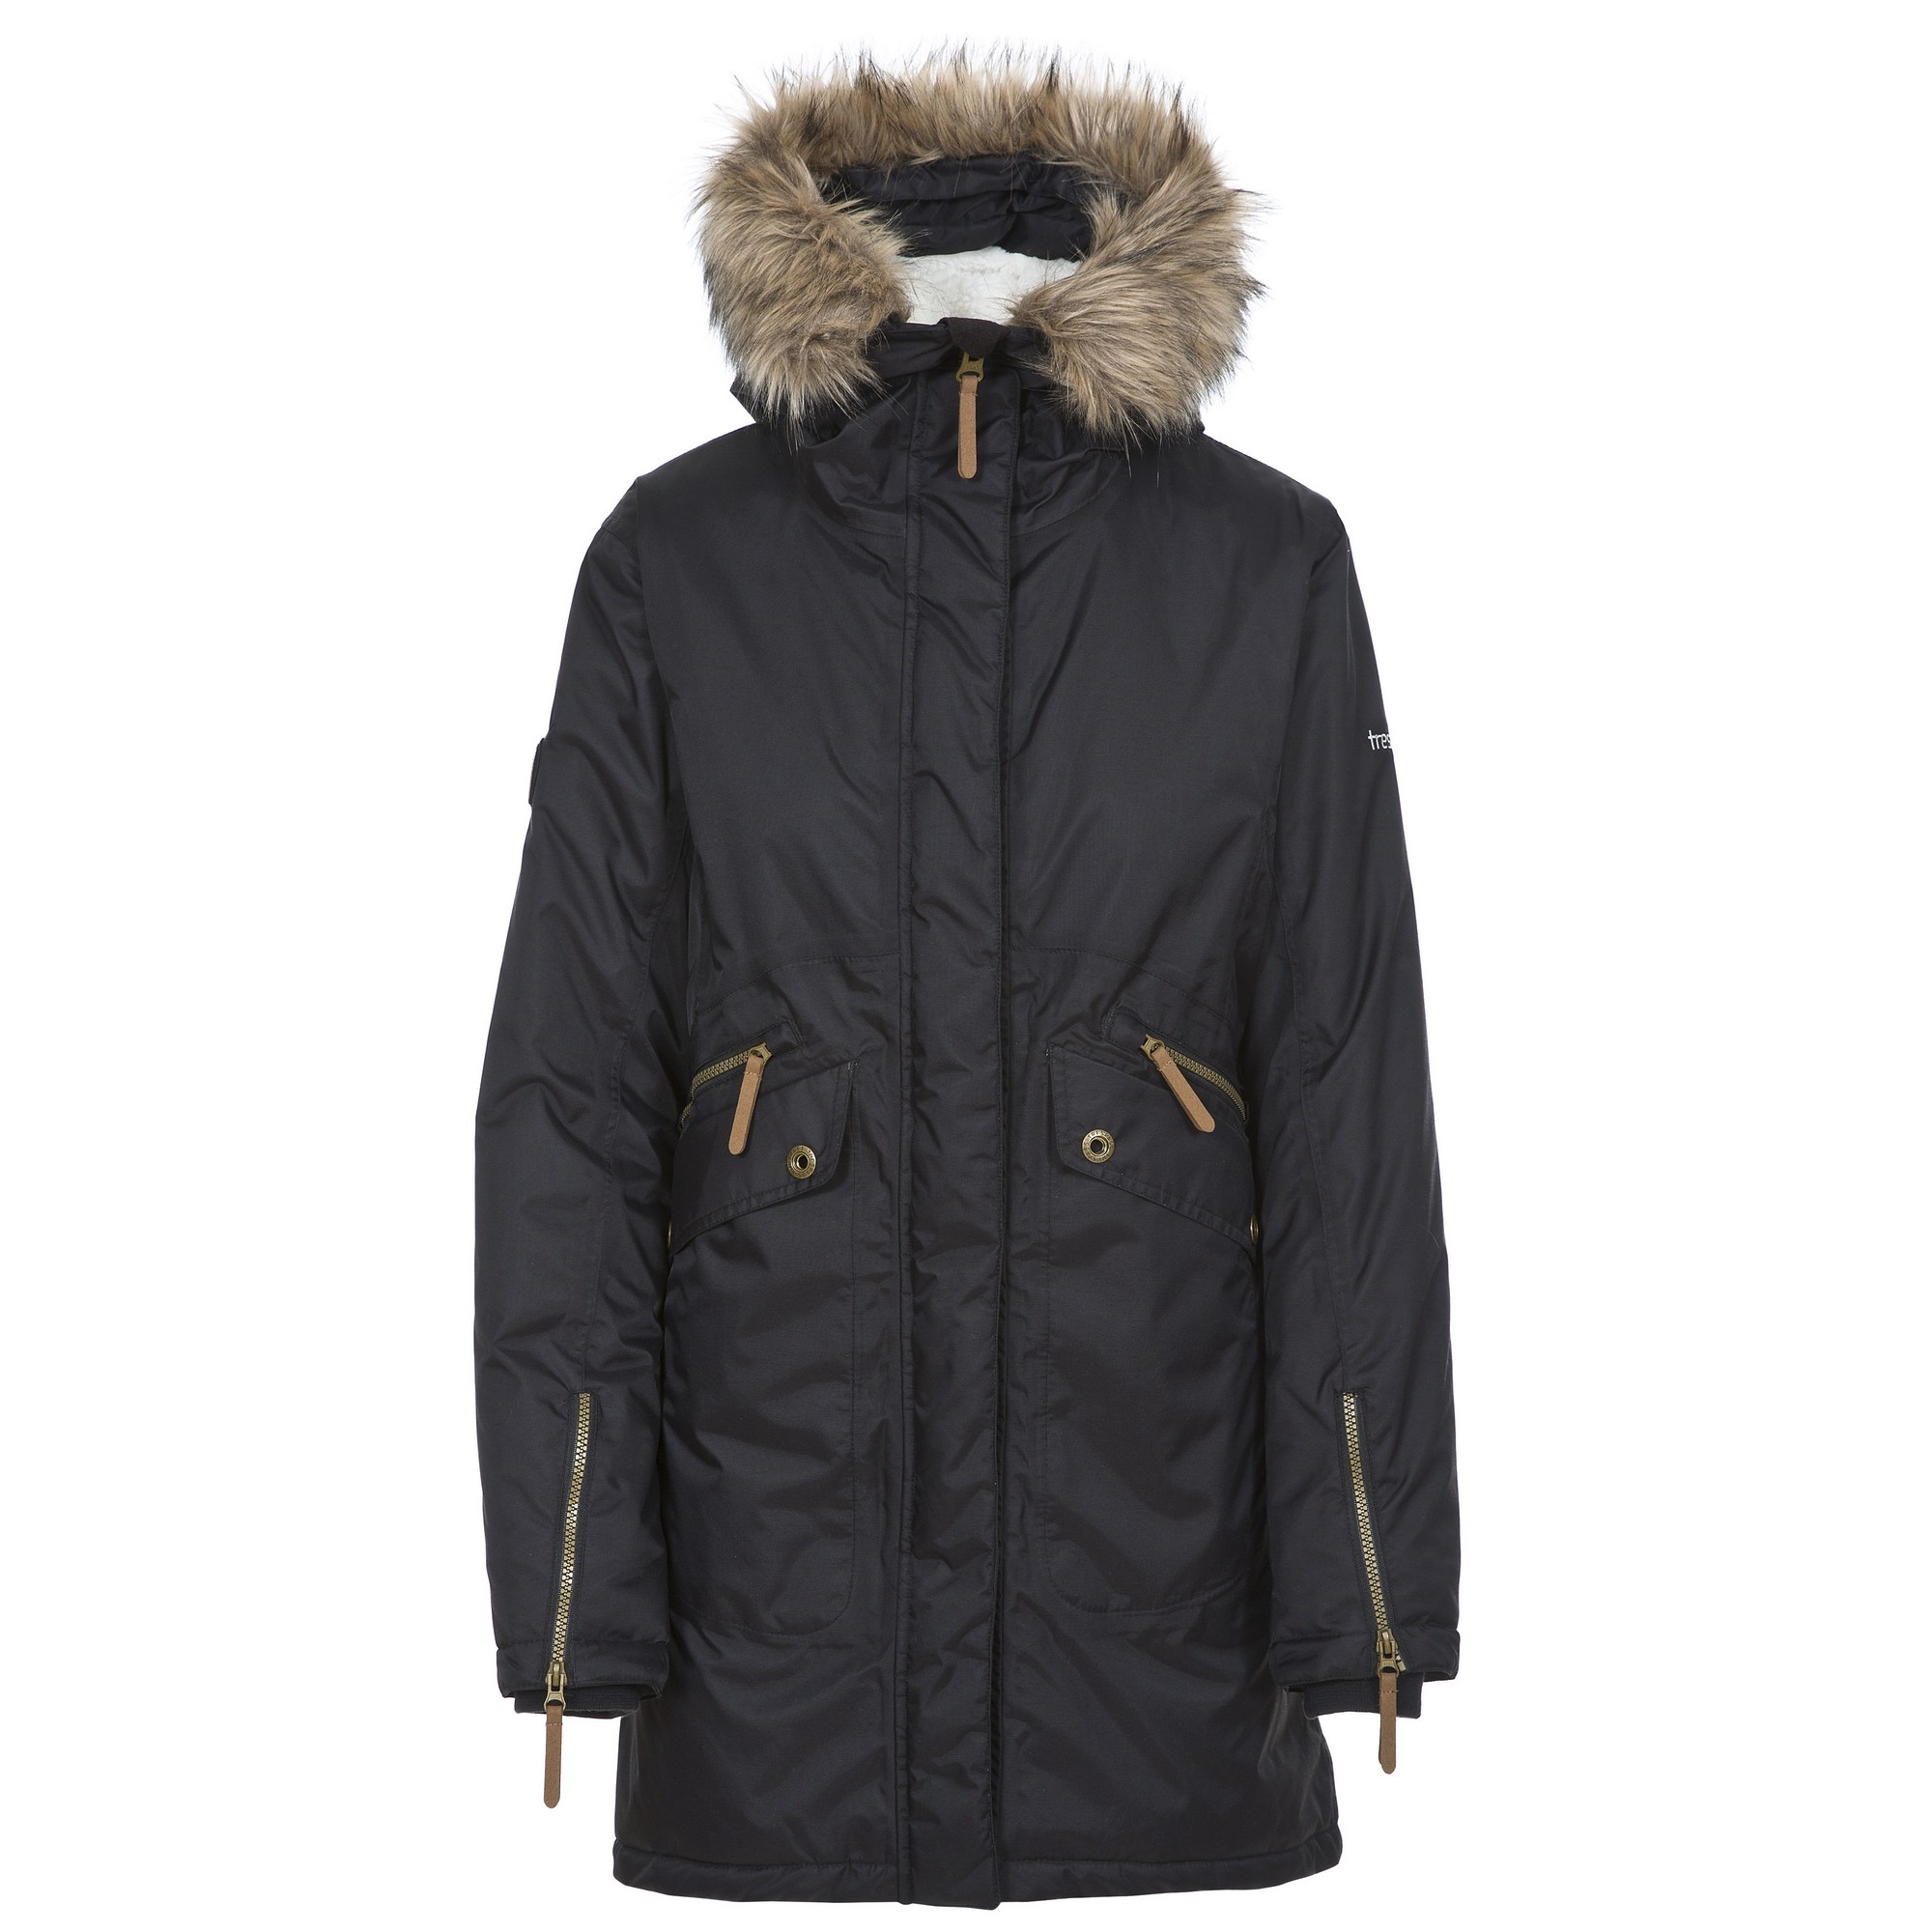 Trespass Womens/Ladies Eternally Waterproof Parka Jacket (XS) (Black)